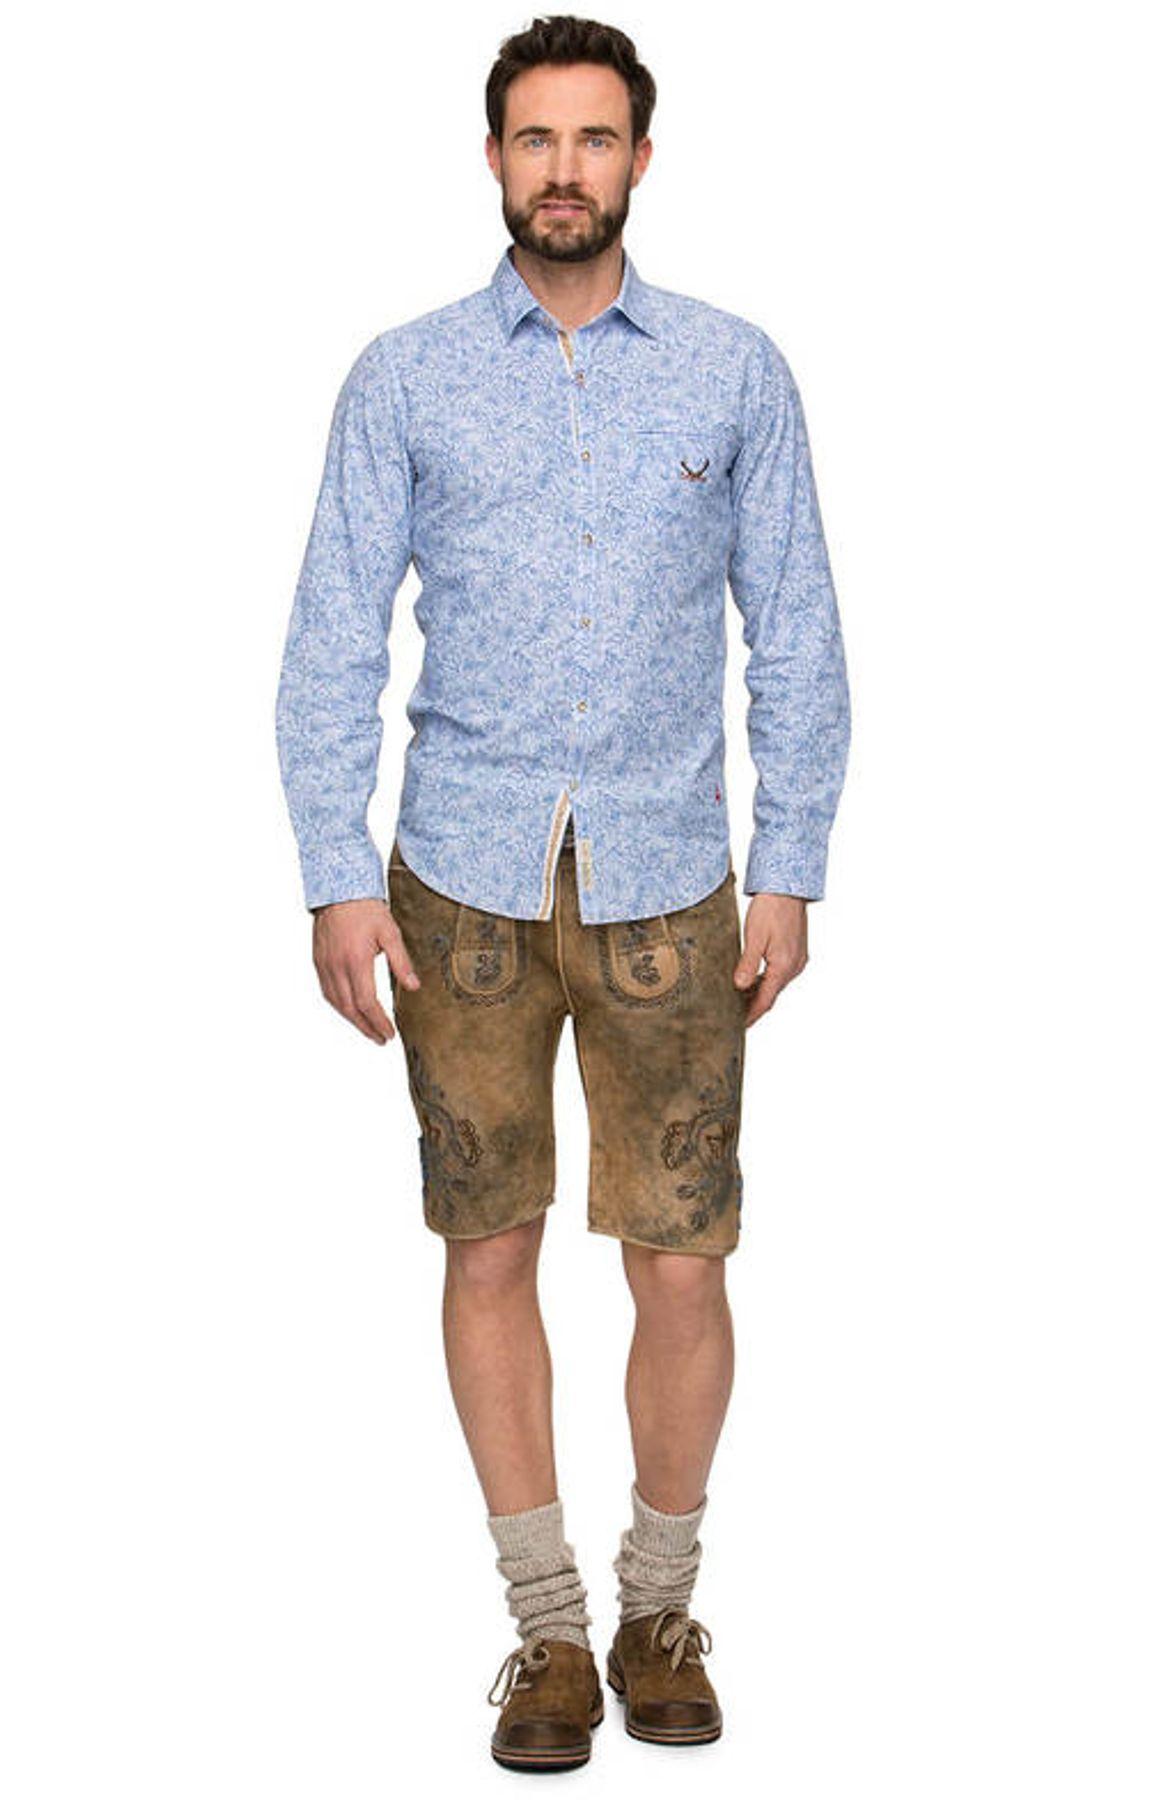 Stockerpoint - Herren Trachtenhemd in Blue stripe, James – Bild 4